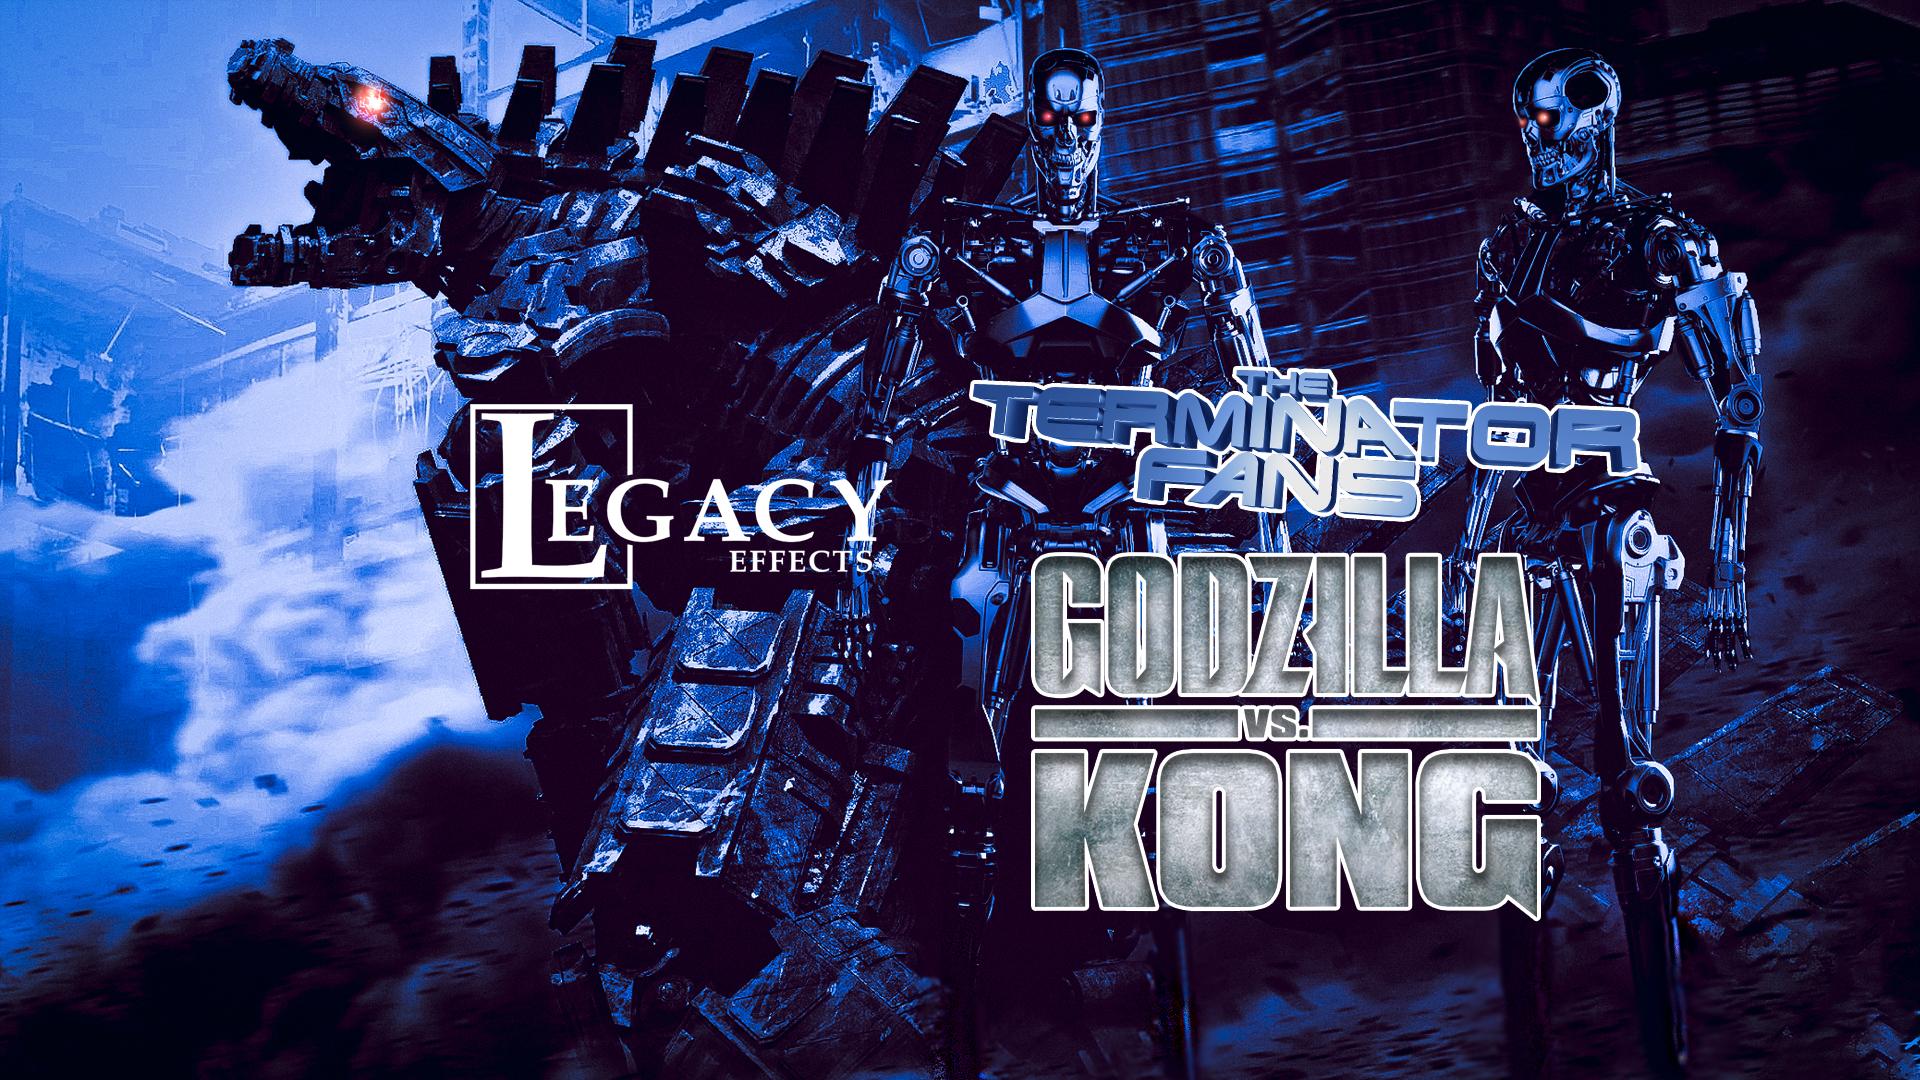 Godzilla Vs Kong Mechagodzilla Inspired by Terminator T-800